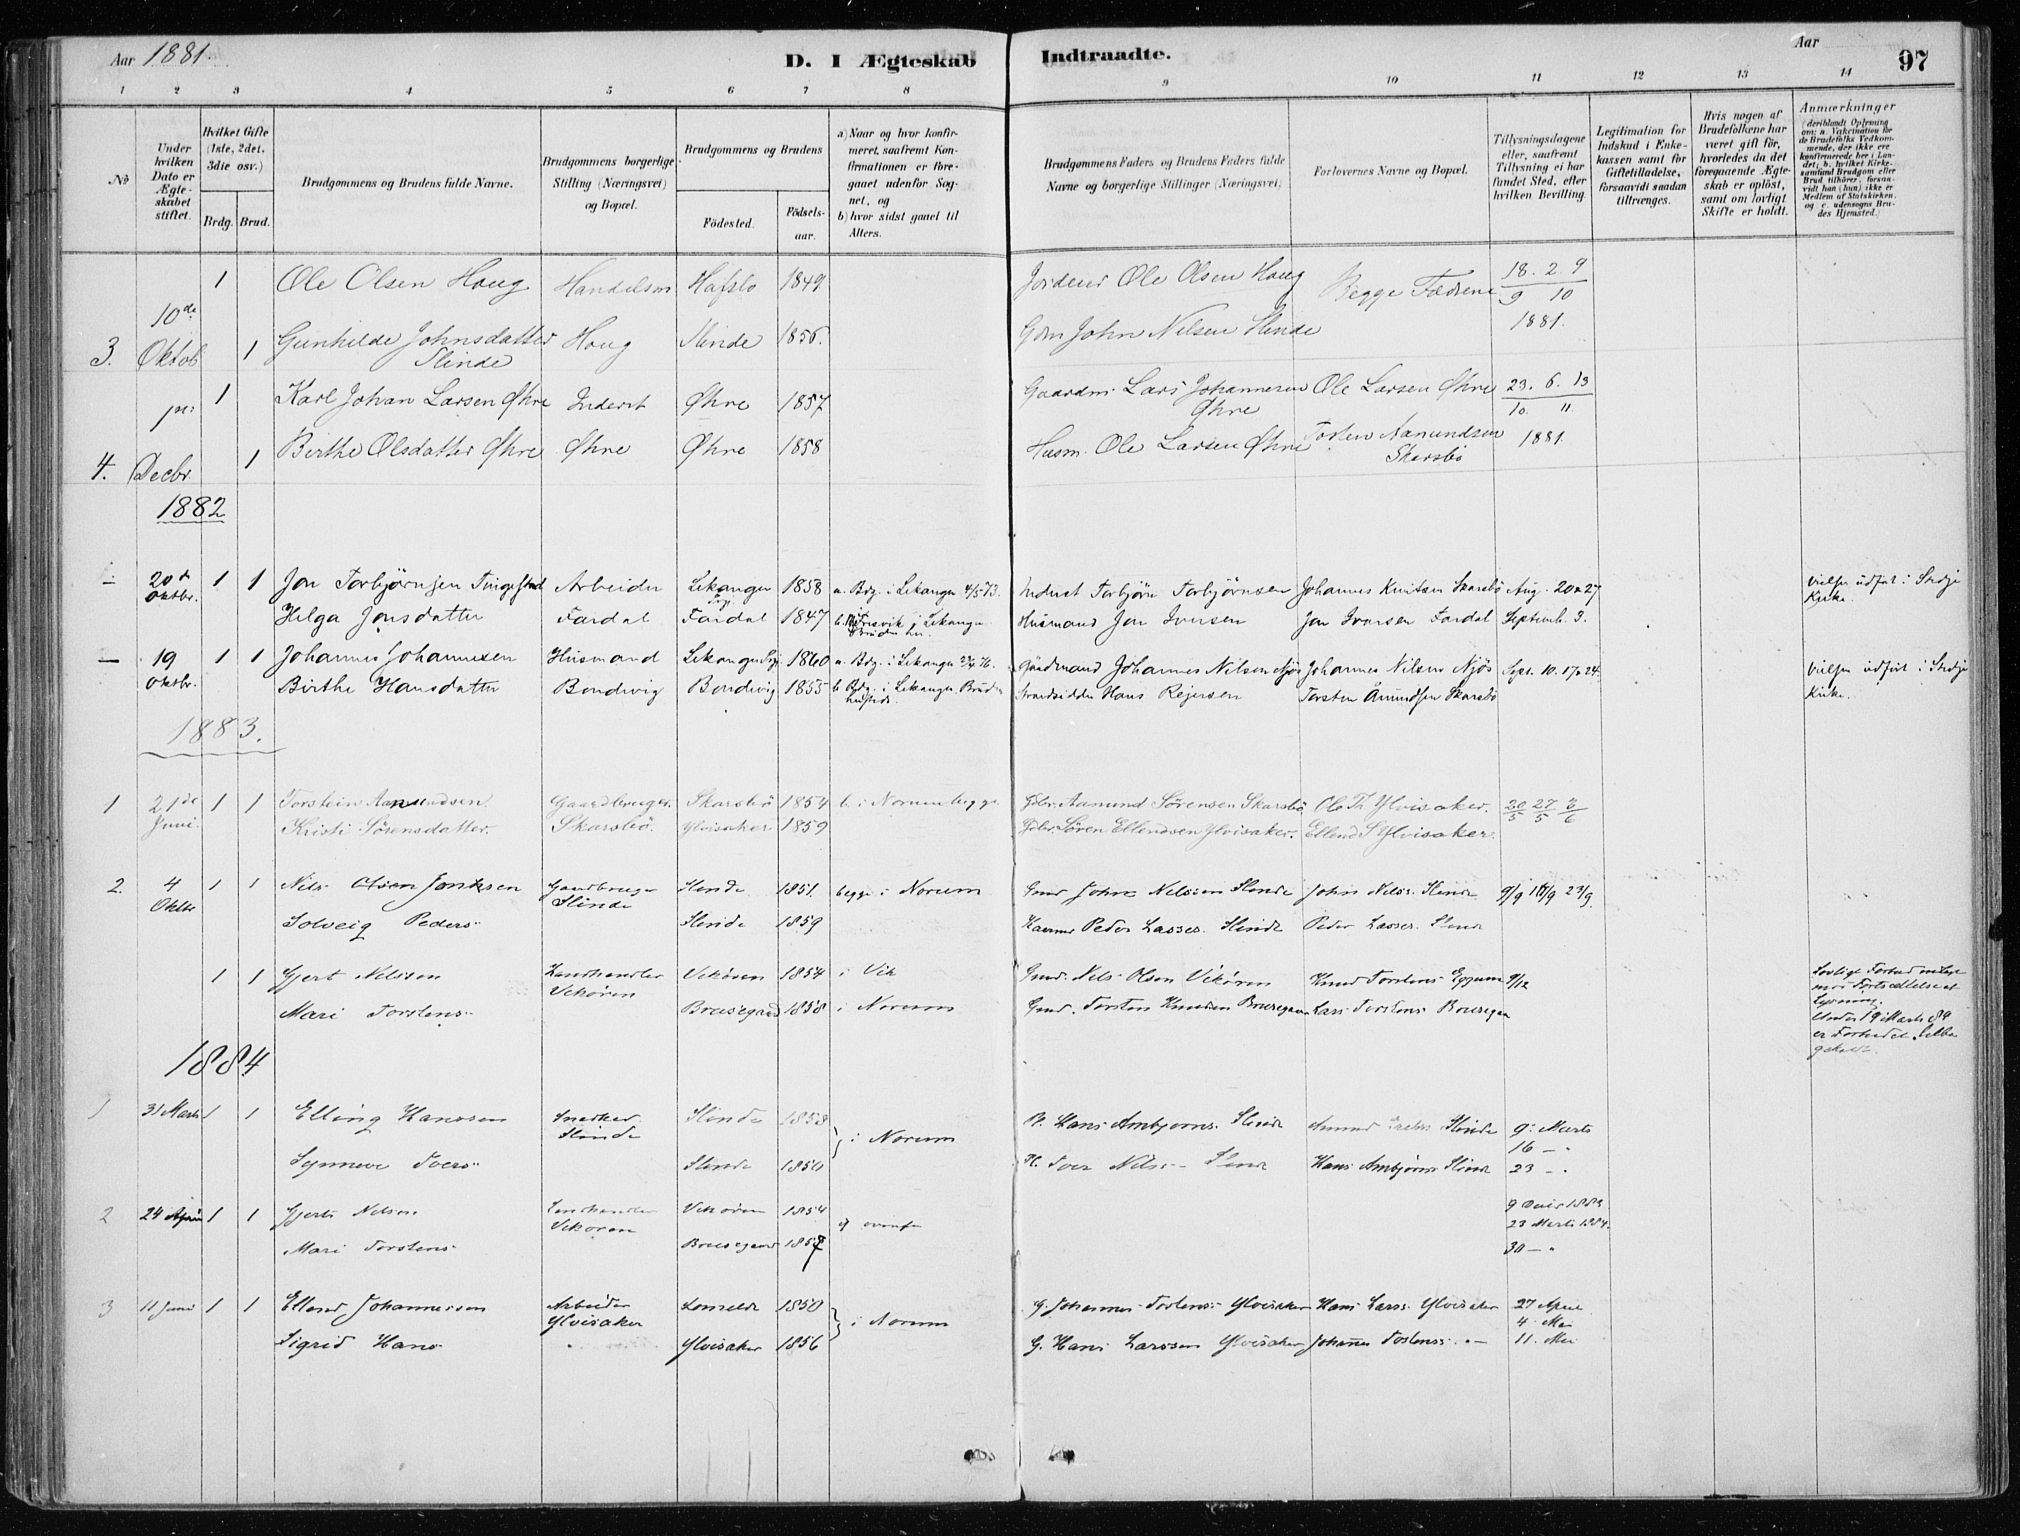 SAB, Sogndal Sokneprestembete, H/Haa/Haac/L0001: Ministerialbok nr. C 1, 1878-1907, s. 97